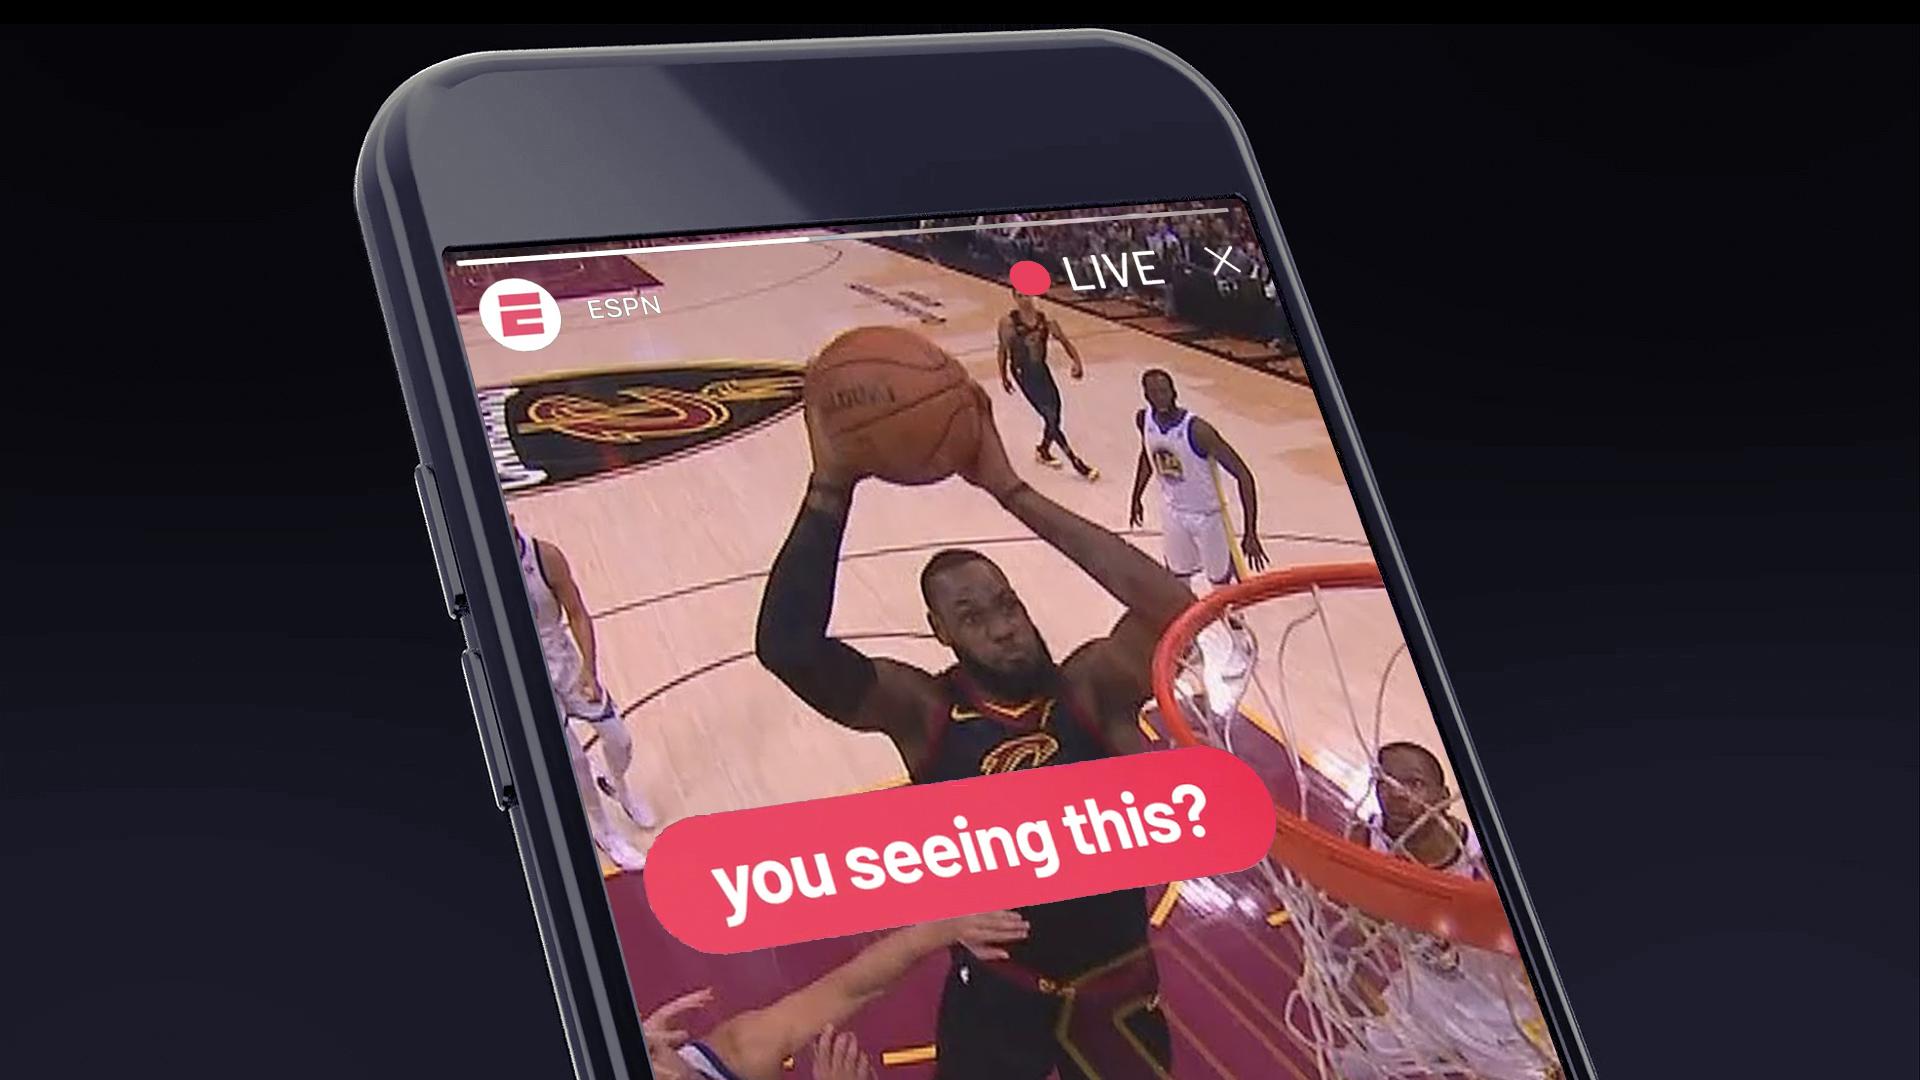 ESPN_YouSeeingThis_03.jpg